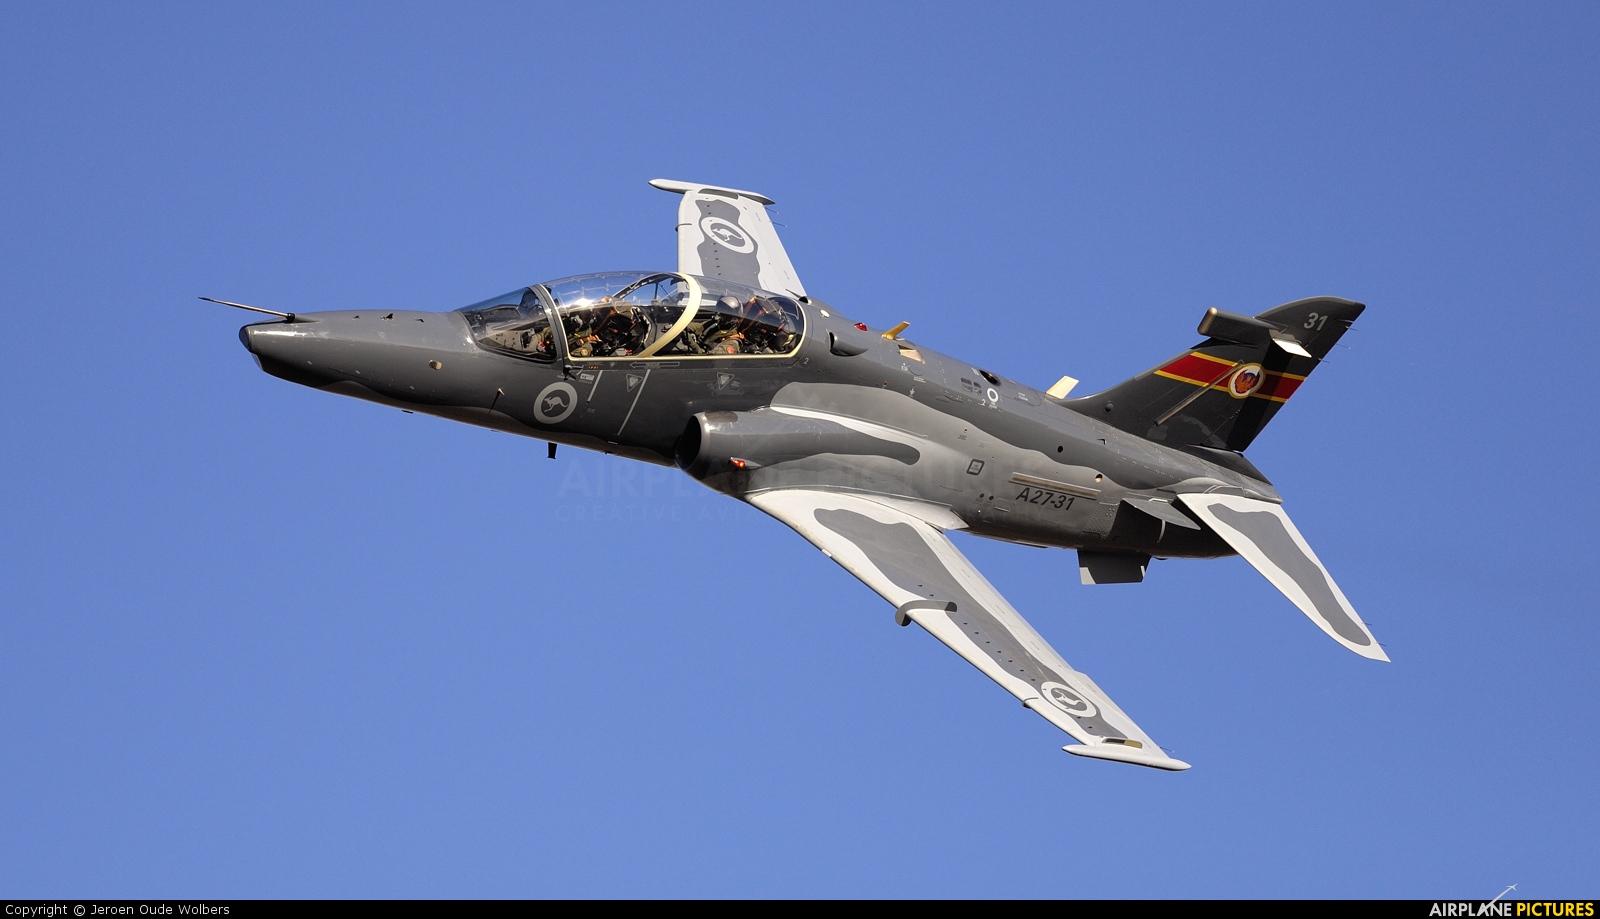 Australia - Air Force A27-31 aircraft at Avalon, VIC